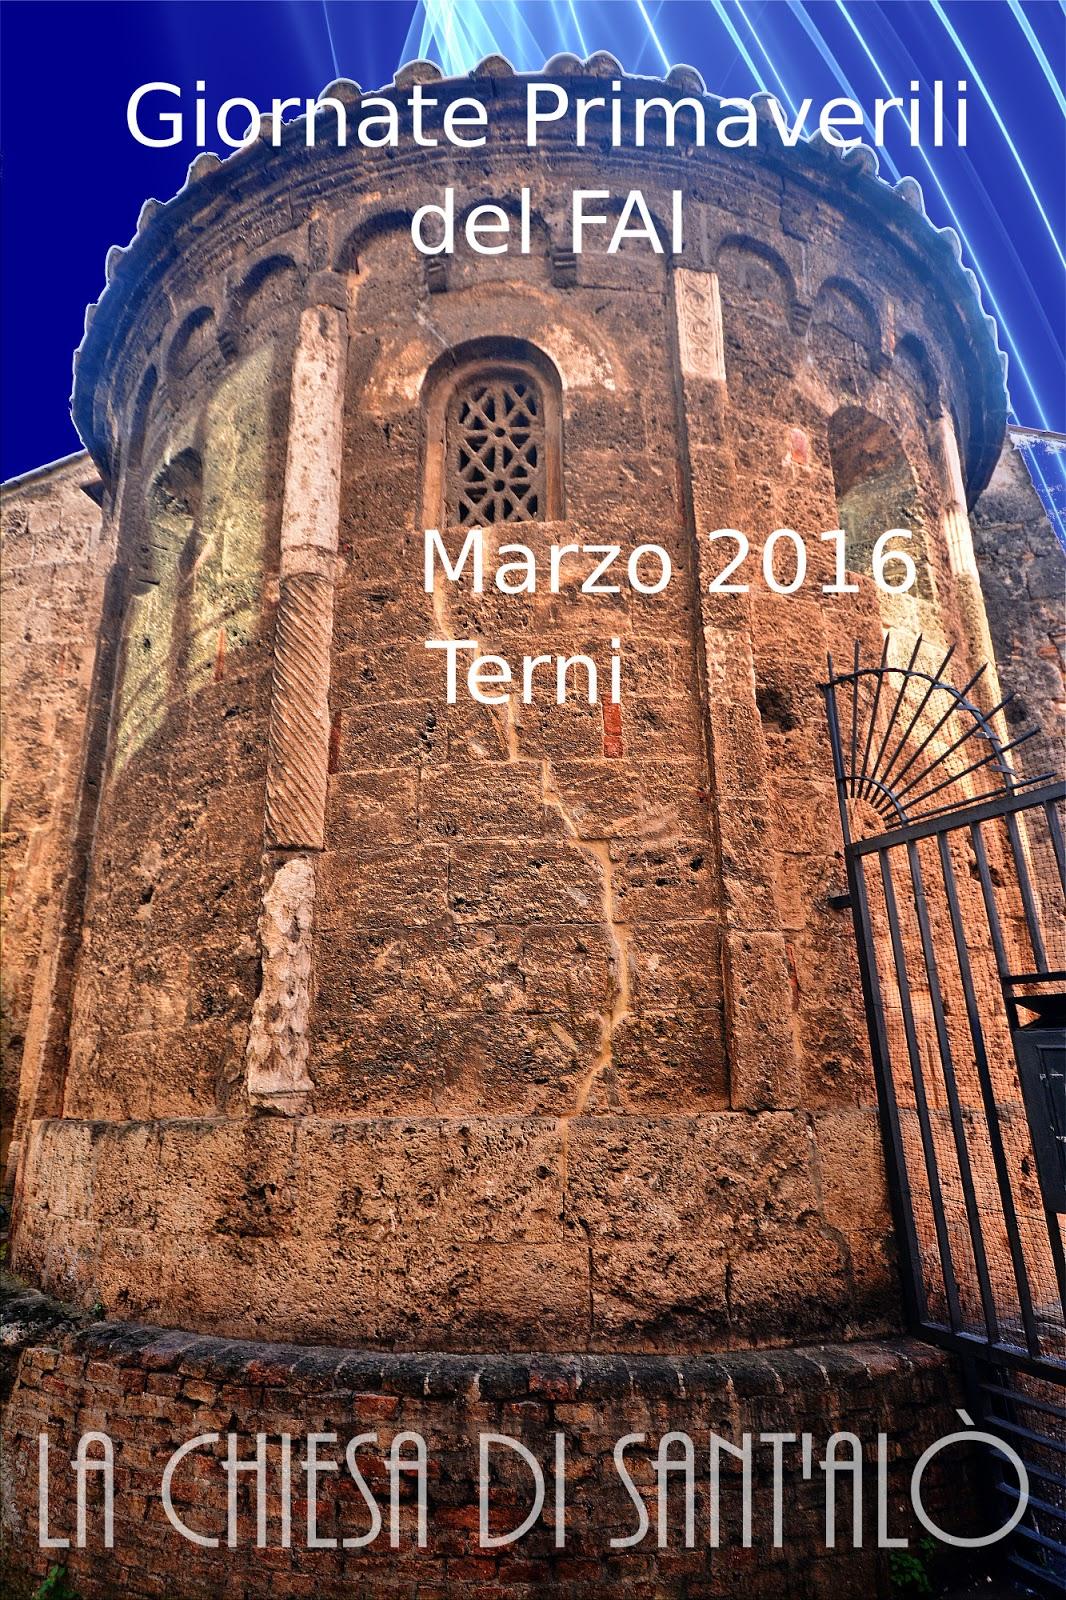 Terni, la storia e le leggende